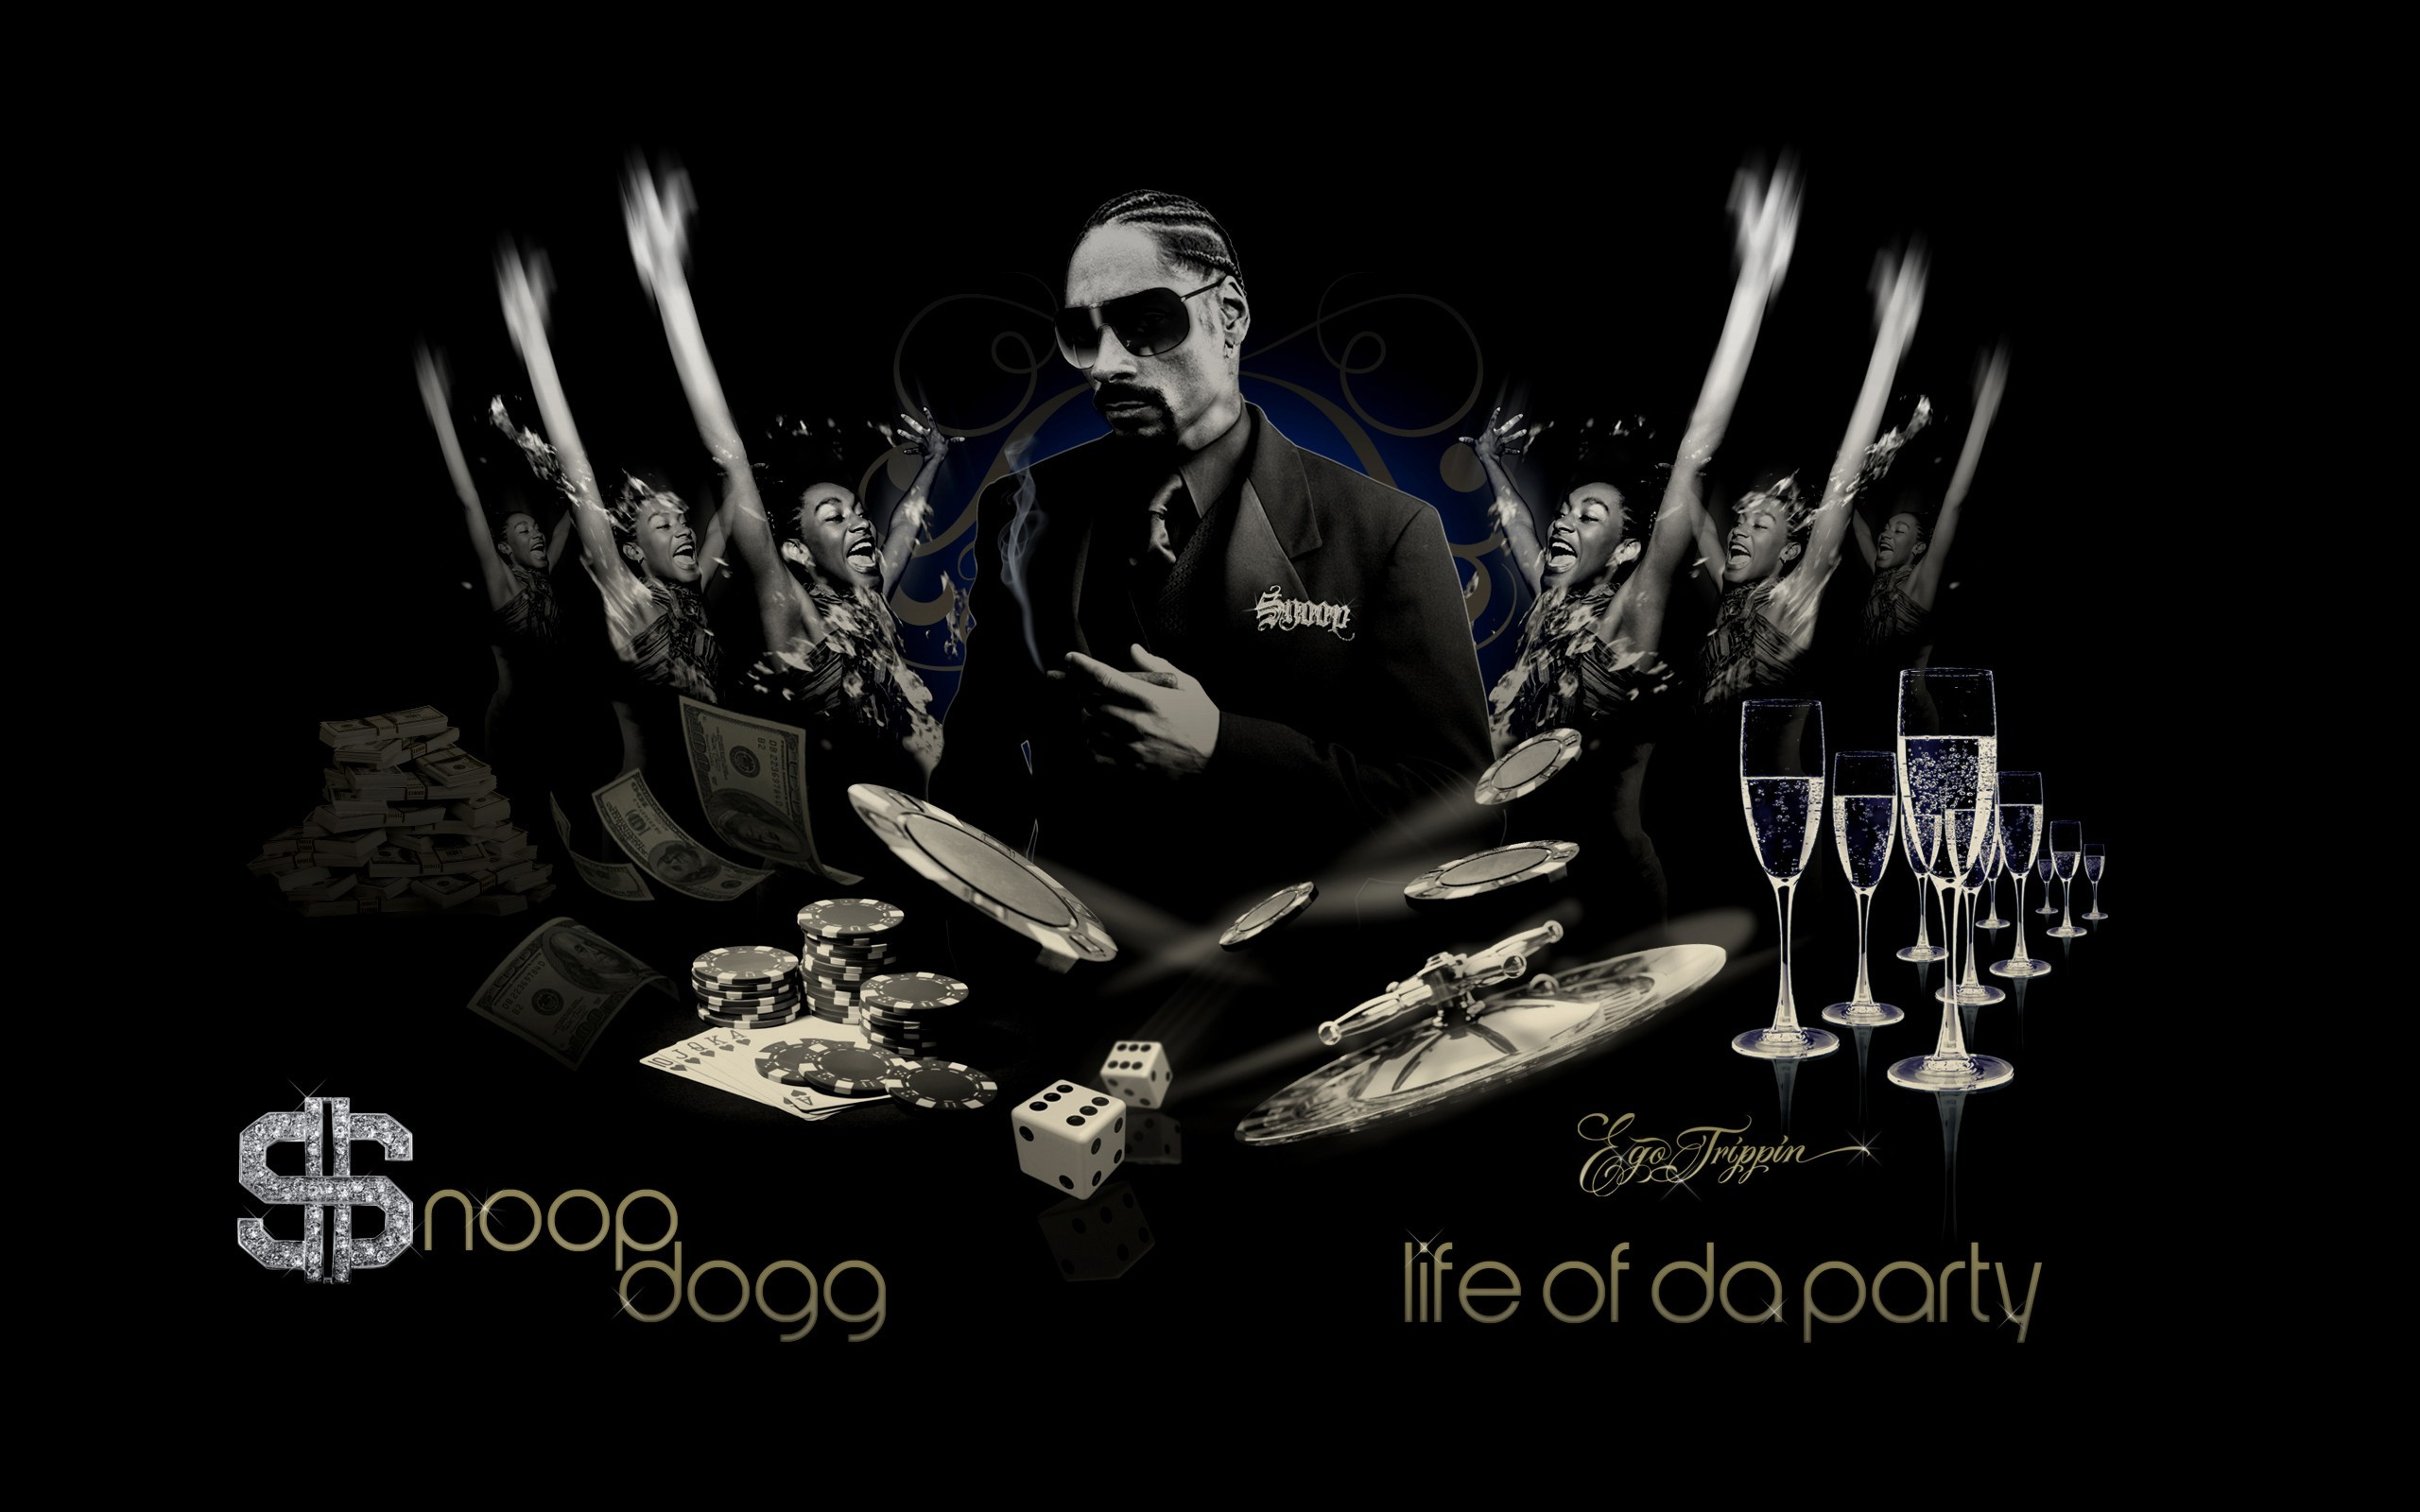 Free Gangsta Life Snoop Dogg Wallpapers, Free Gangsta Life Snoop Dogg .